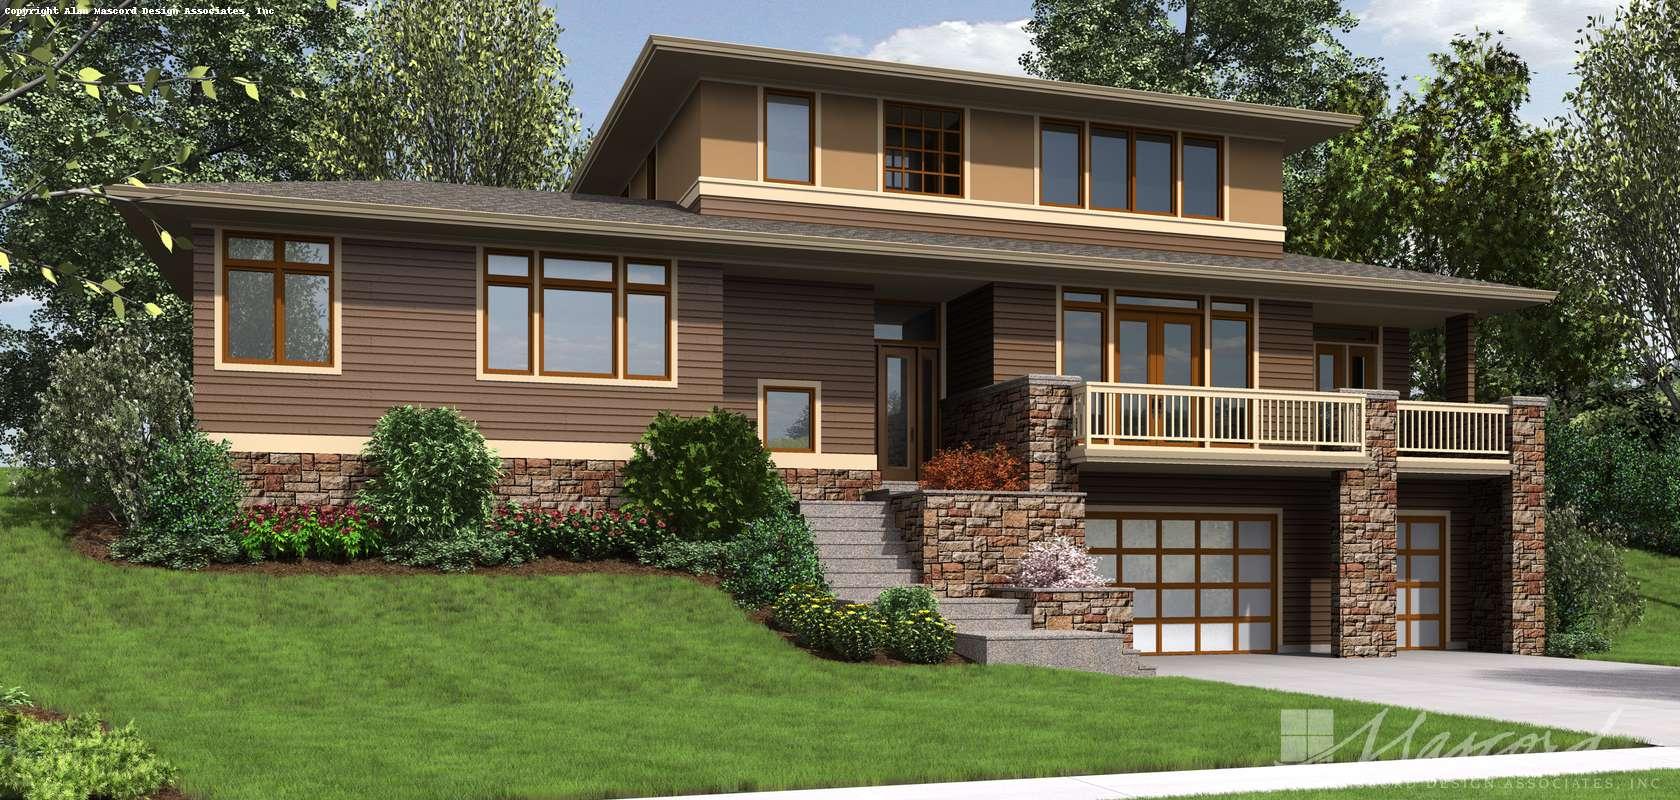 Mascord House Plan 22197A: The Burbank